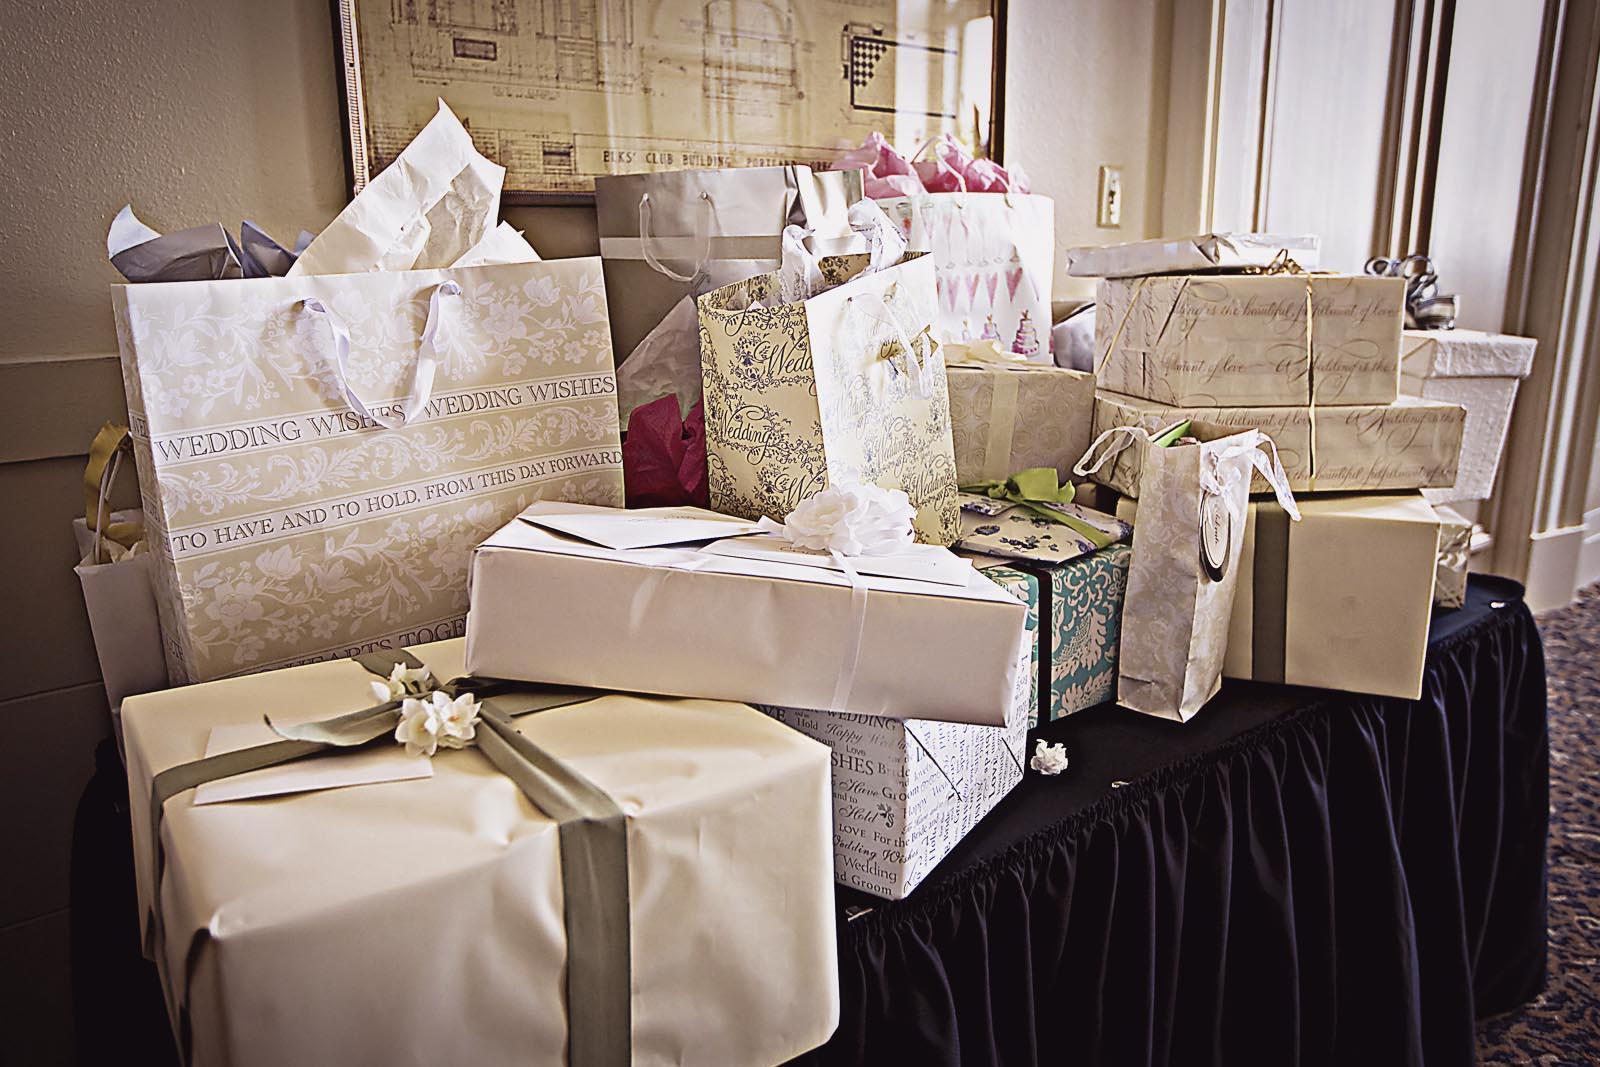 The Anatomy Of A Wedding Registry